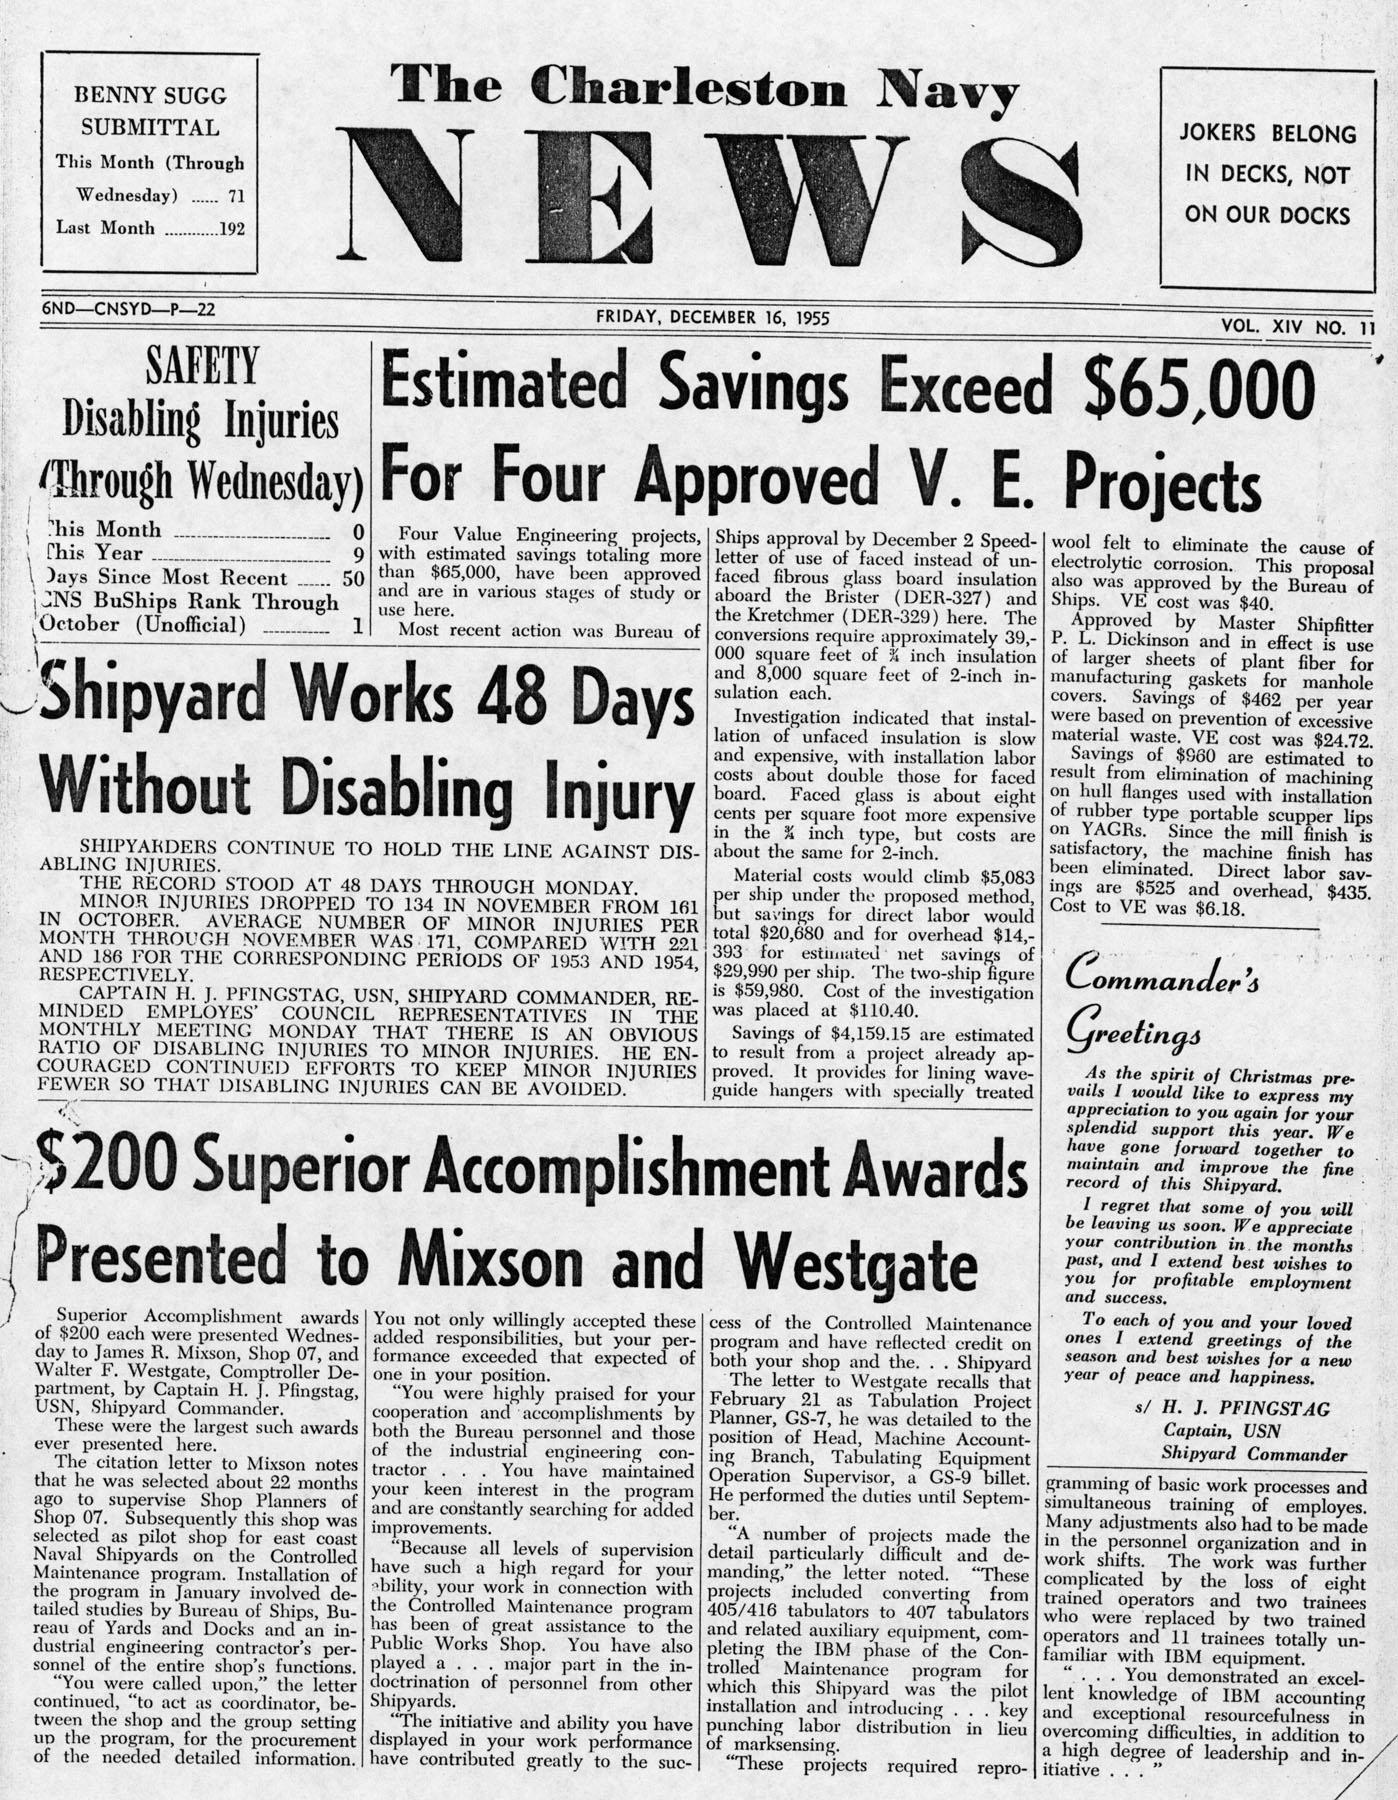 The Charleston Navy News, Volume 14, Edition 11, page i